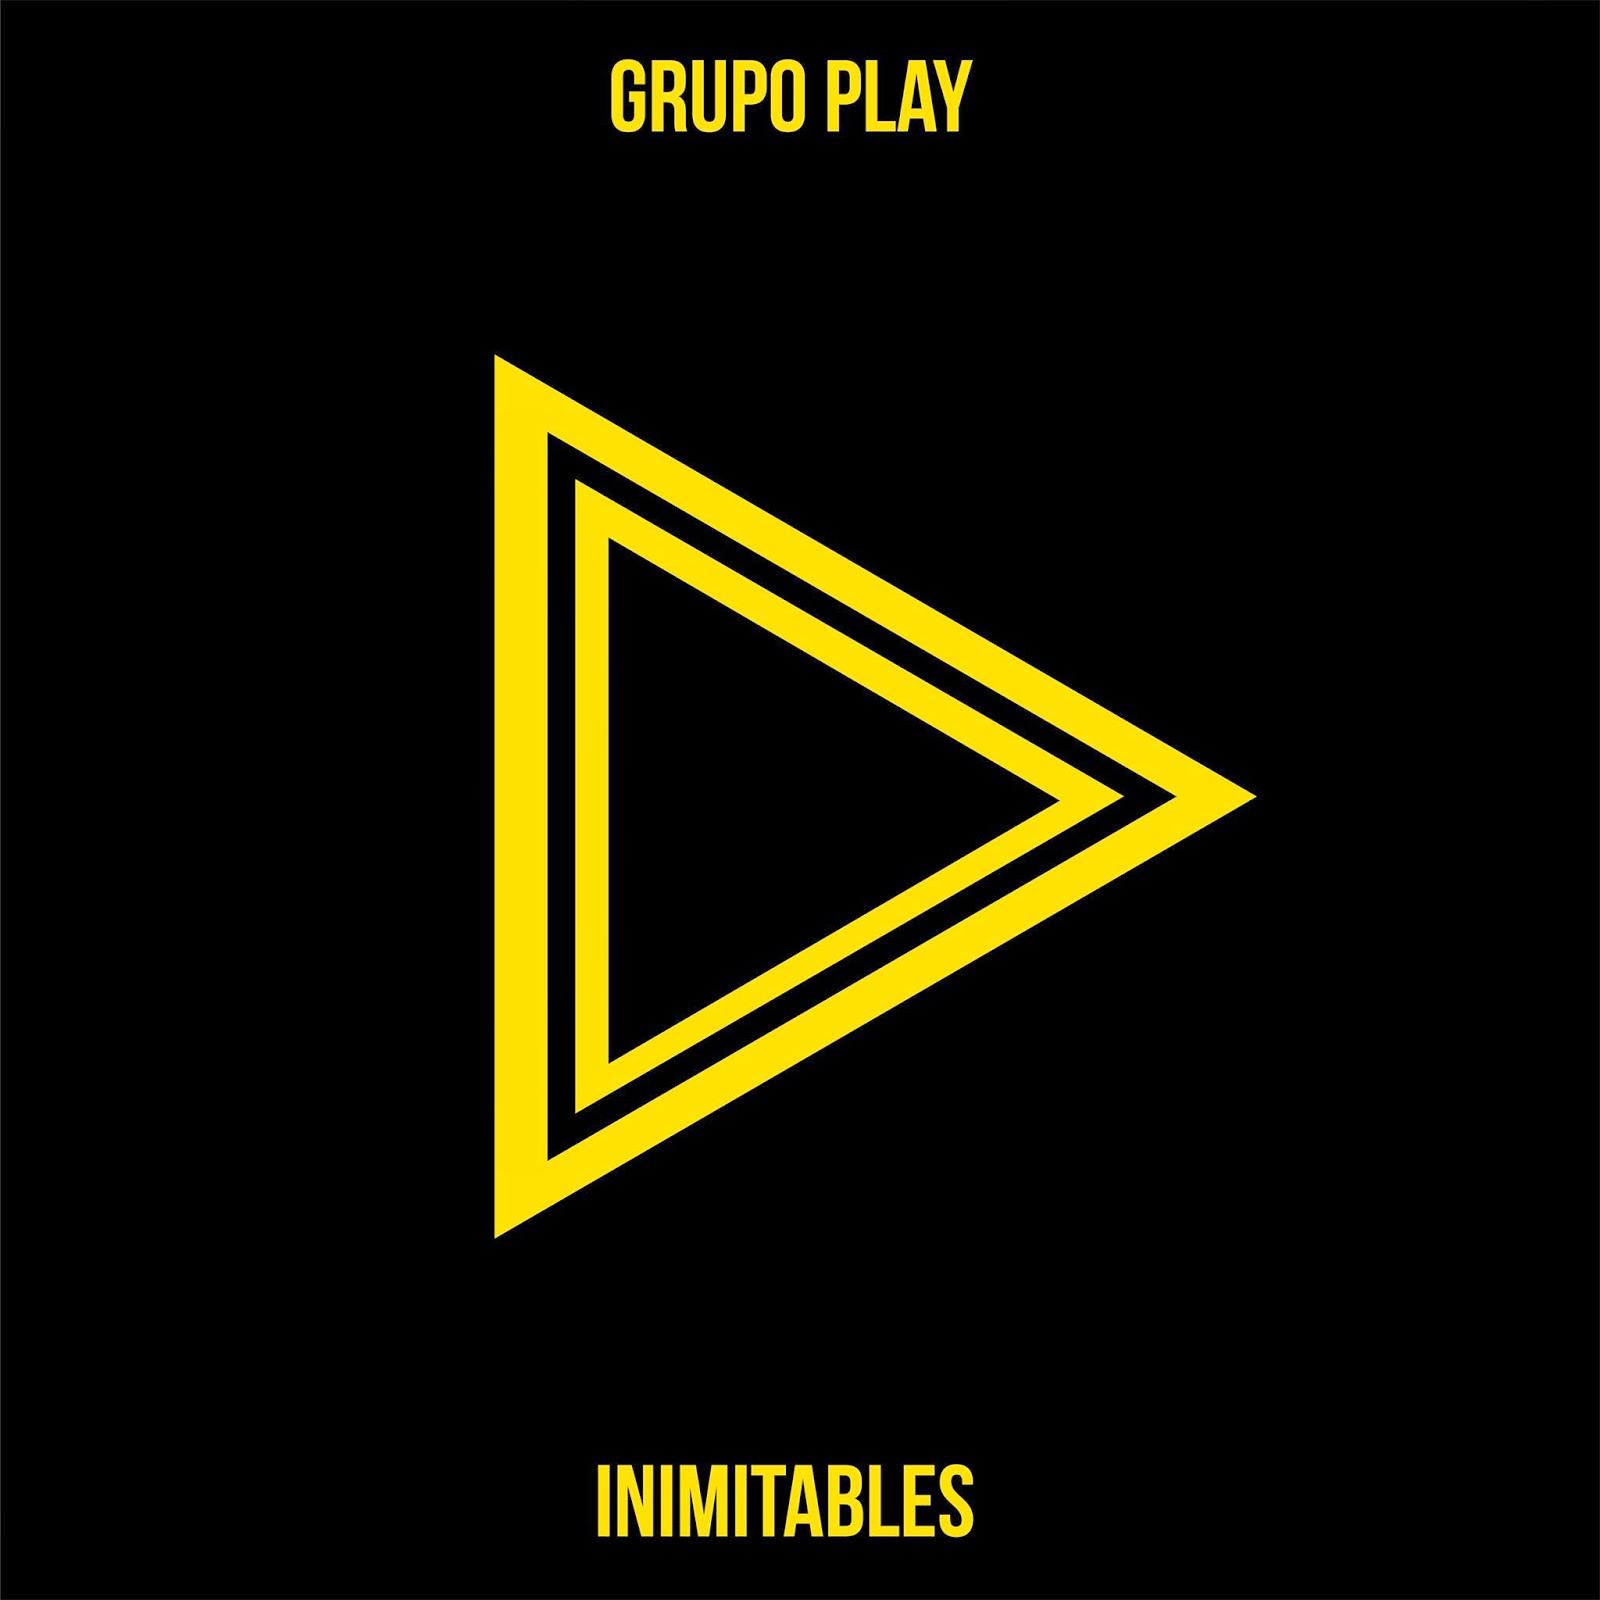 Grupo Play - Inimitables (2014)